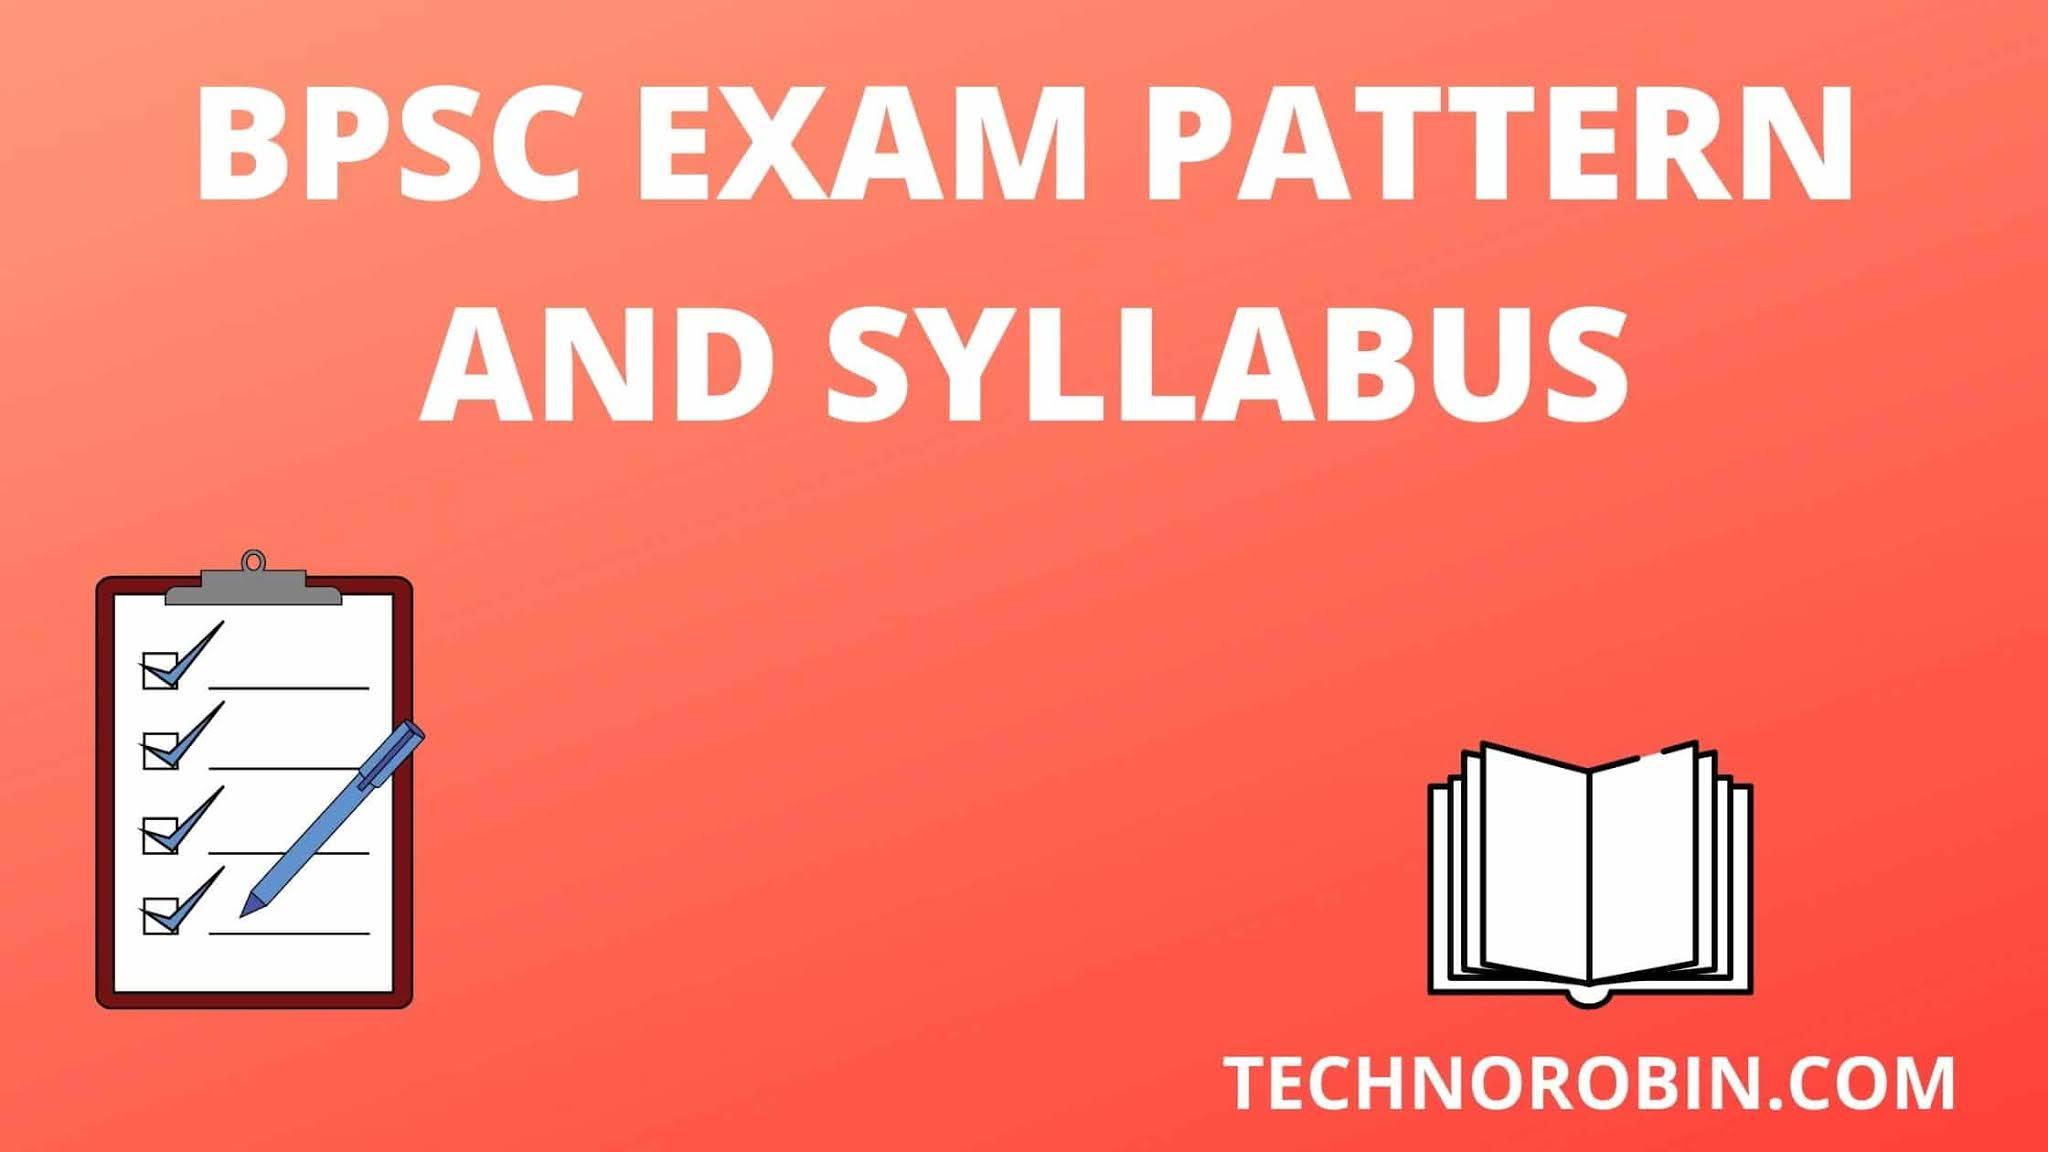 BPSC exam syllabus 2020- Exam Pattern and Syllabus